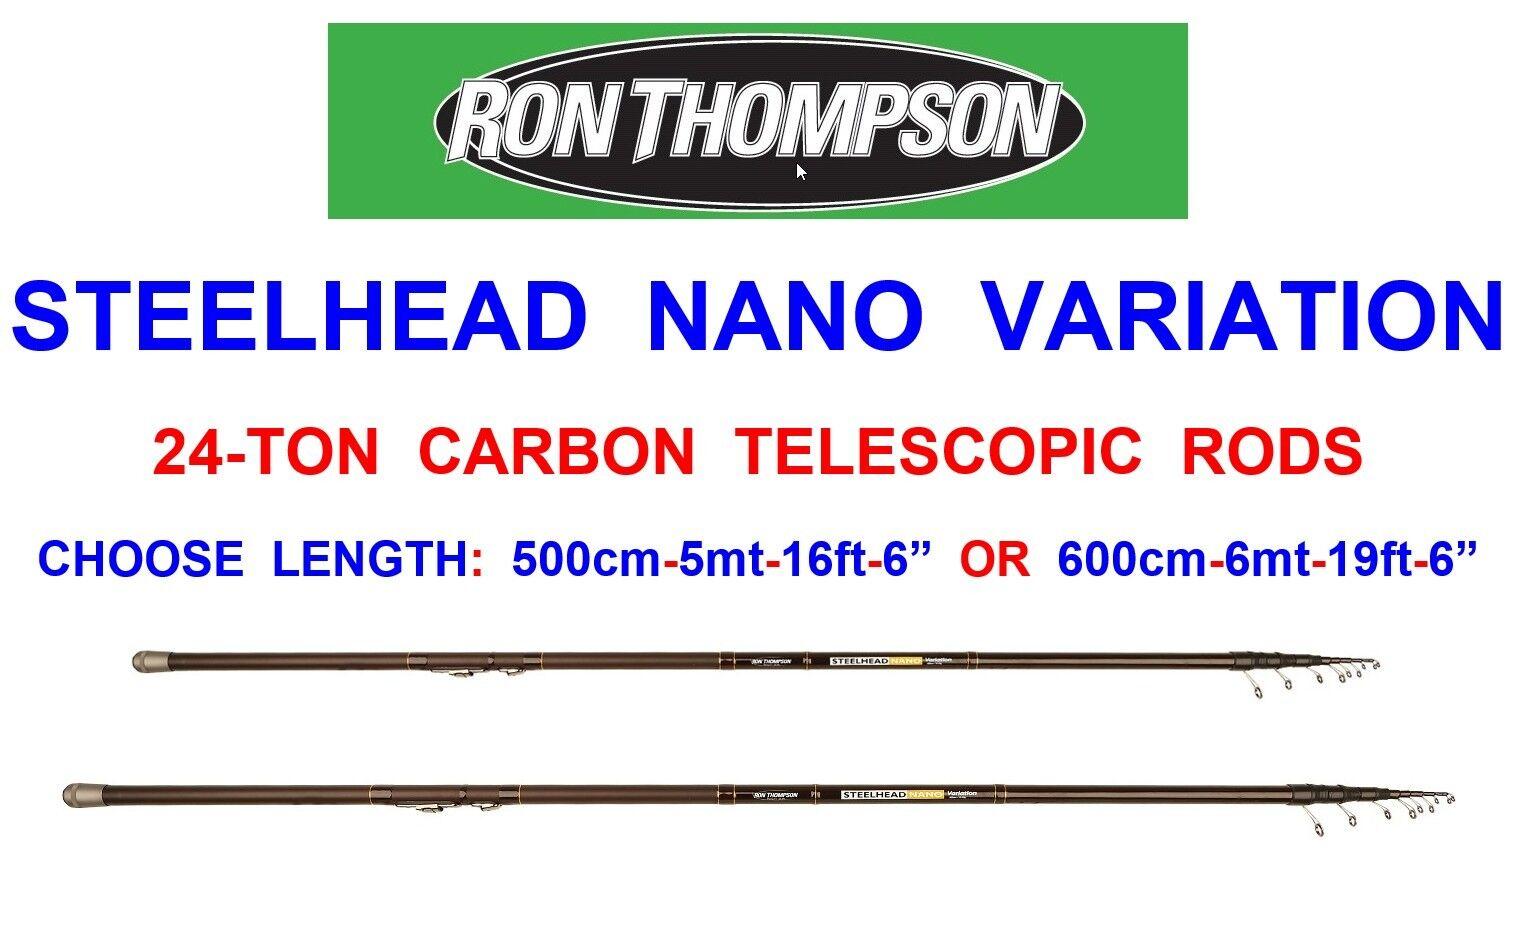 RON THOMSON STEELHEAD NANO VARIABinden 24-TON AutoBON TELESCOPIC DAPPING ROD POLE